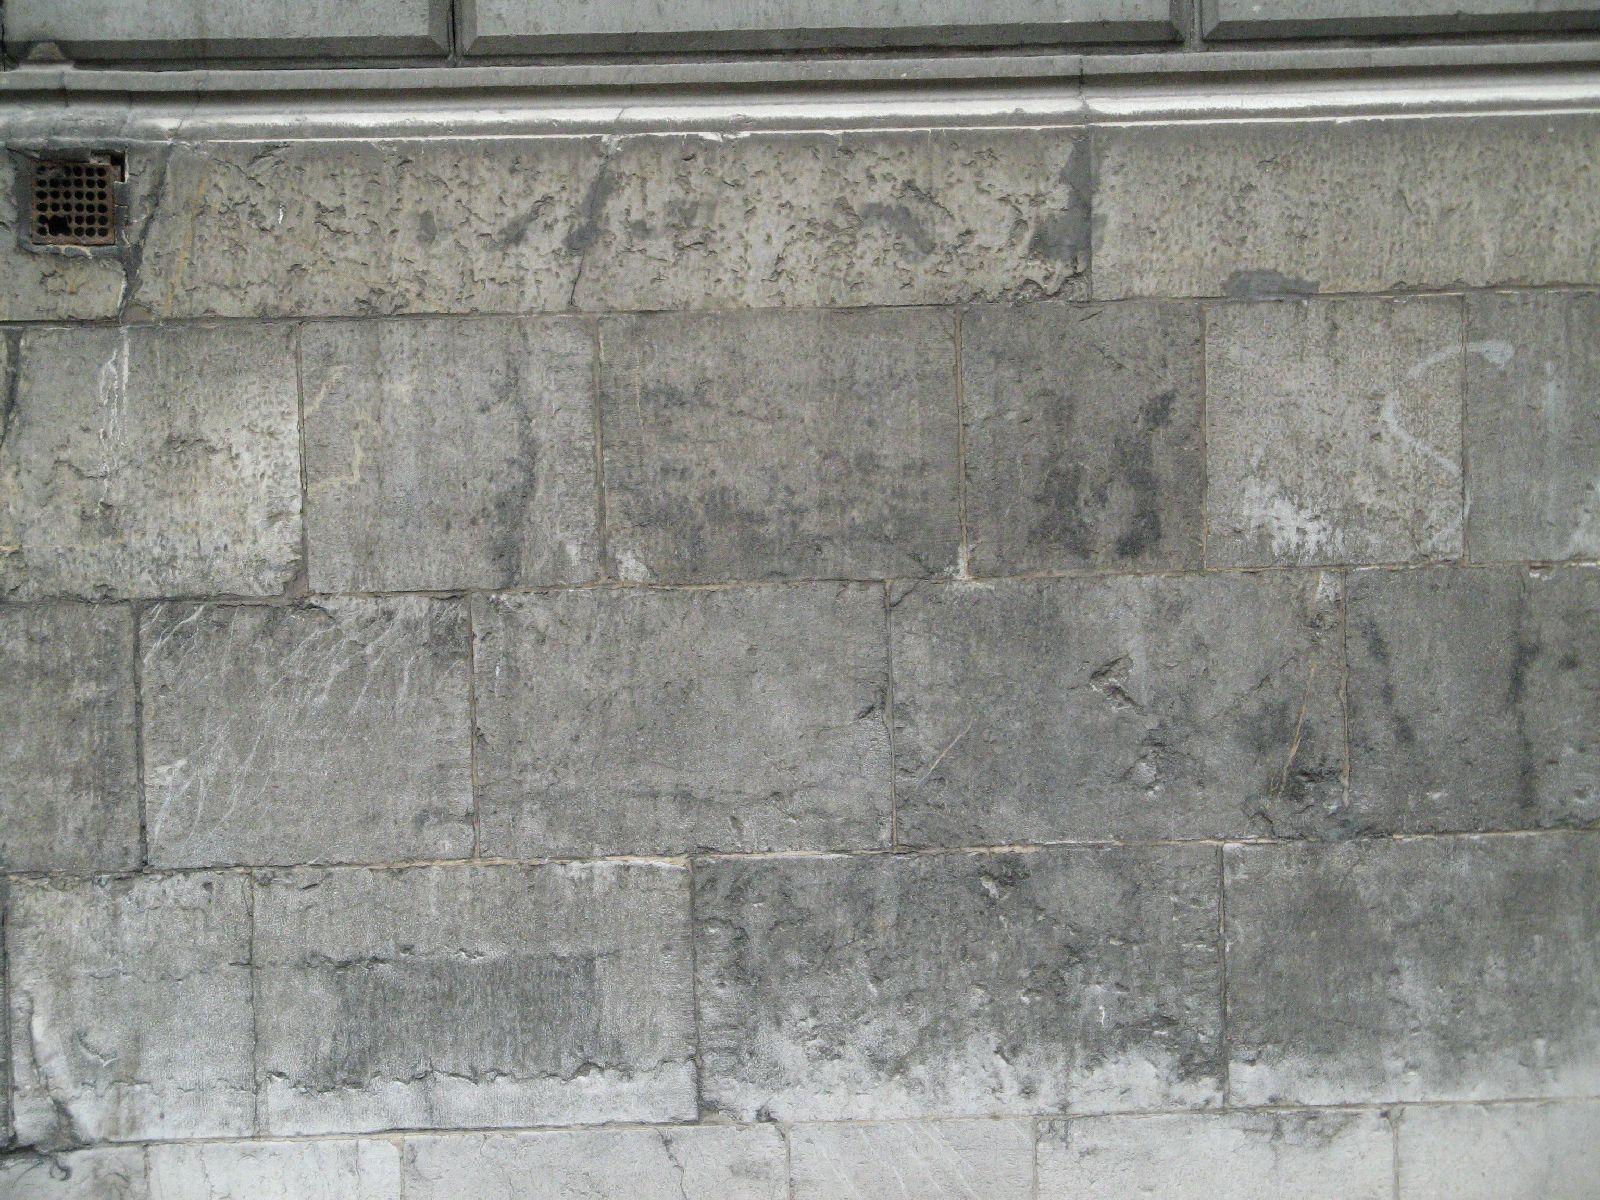 Brick_Texture_B_0406